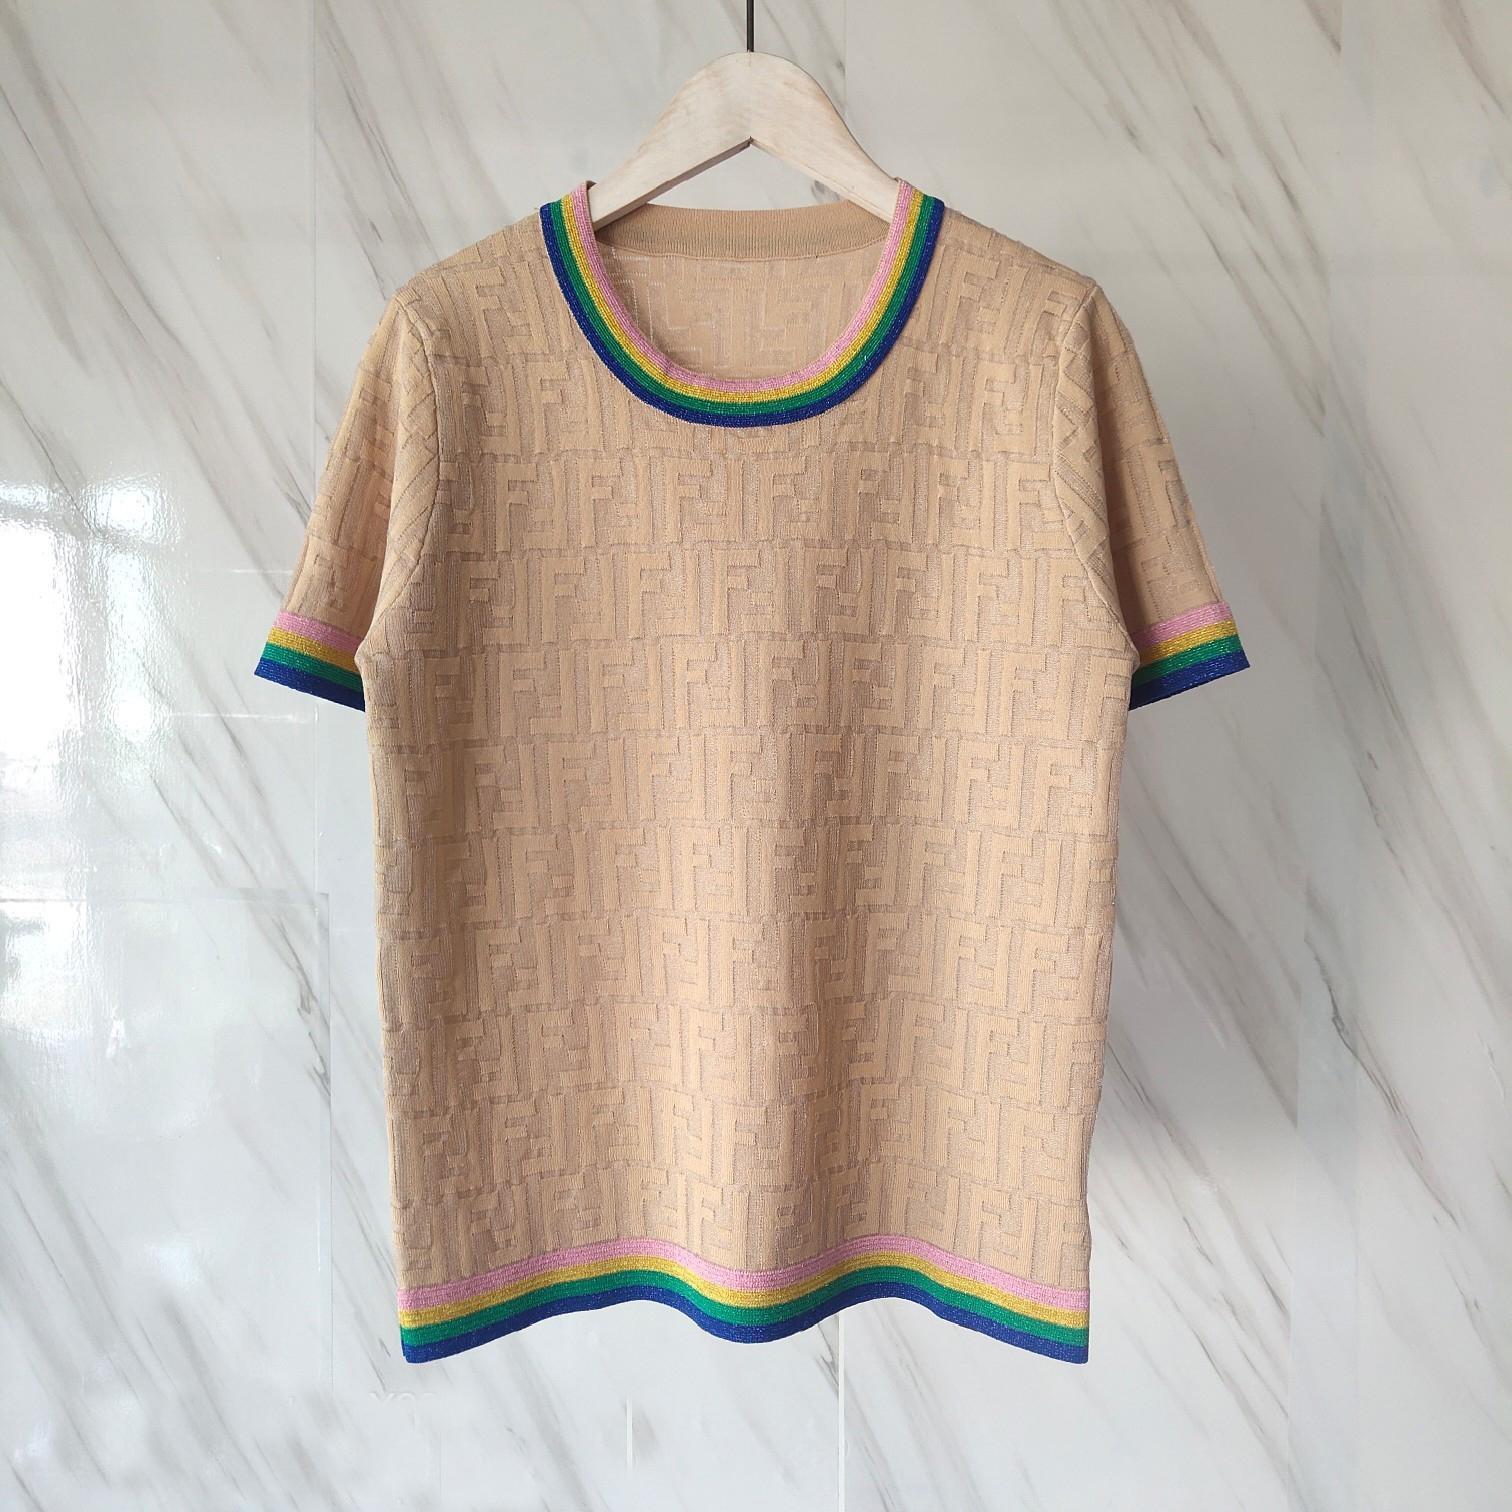 Hot Luxuxentwerfer Frauen Shirts Mode Top Quility Damen Knit T-Shirts beiläufige Marken-Top Tees FF Brief Mädchen Kurzarmhemd F 2052603H